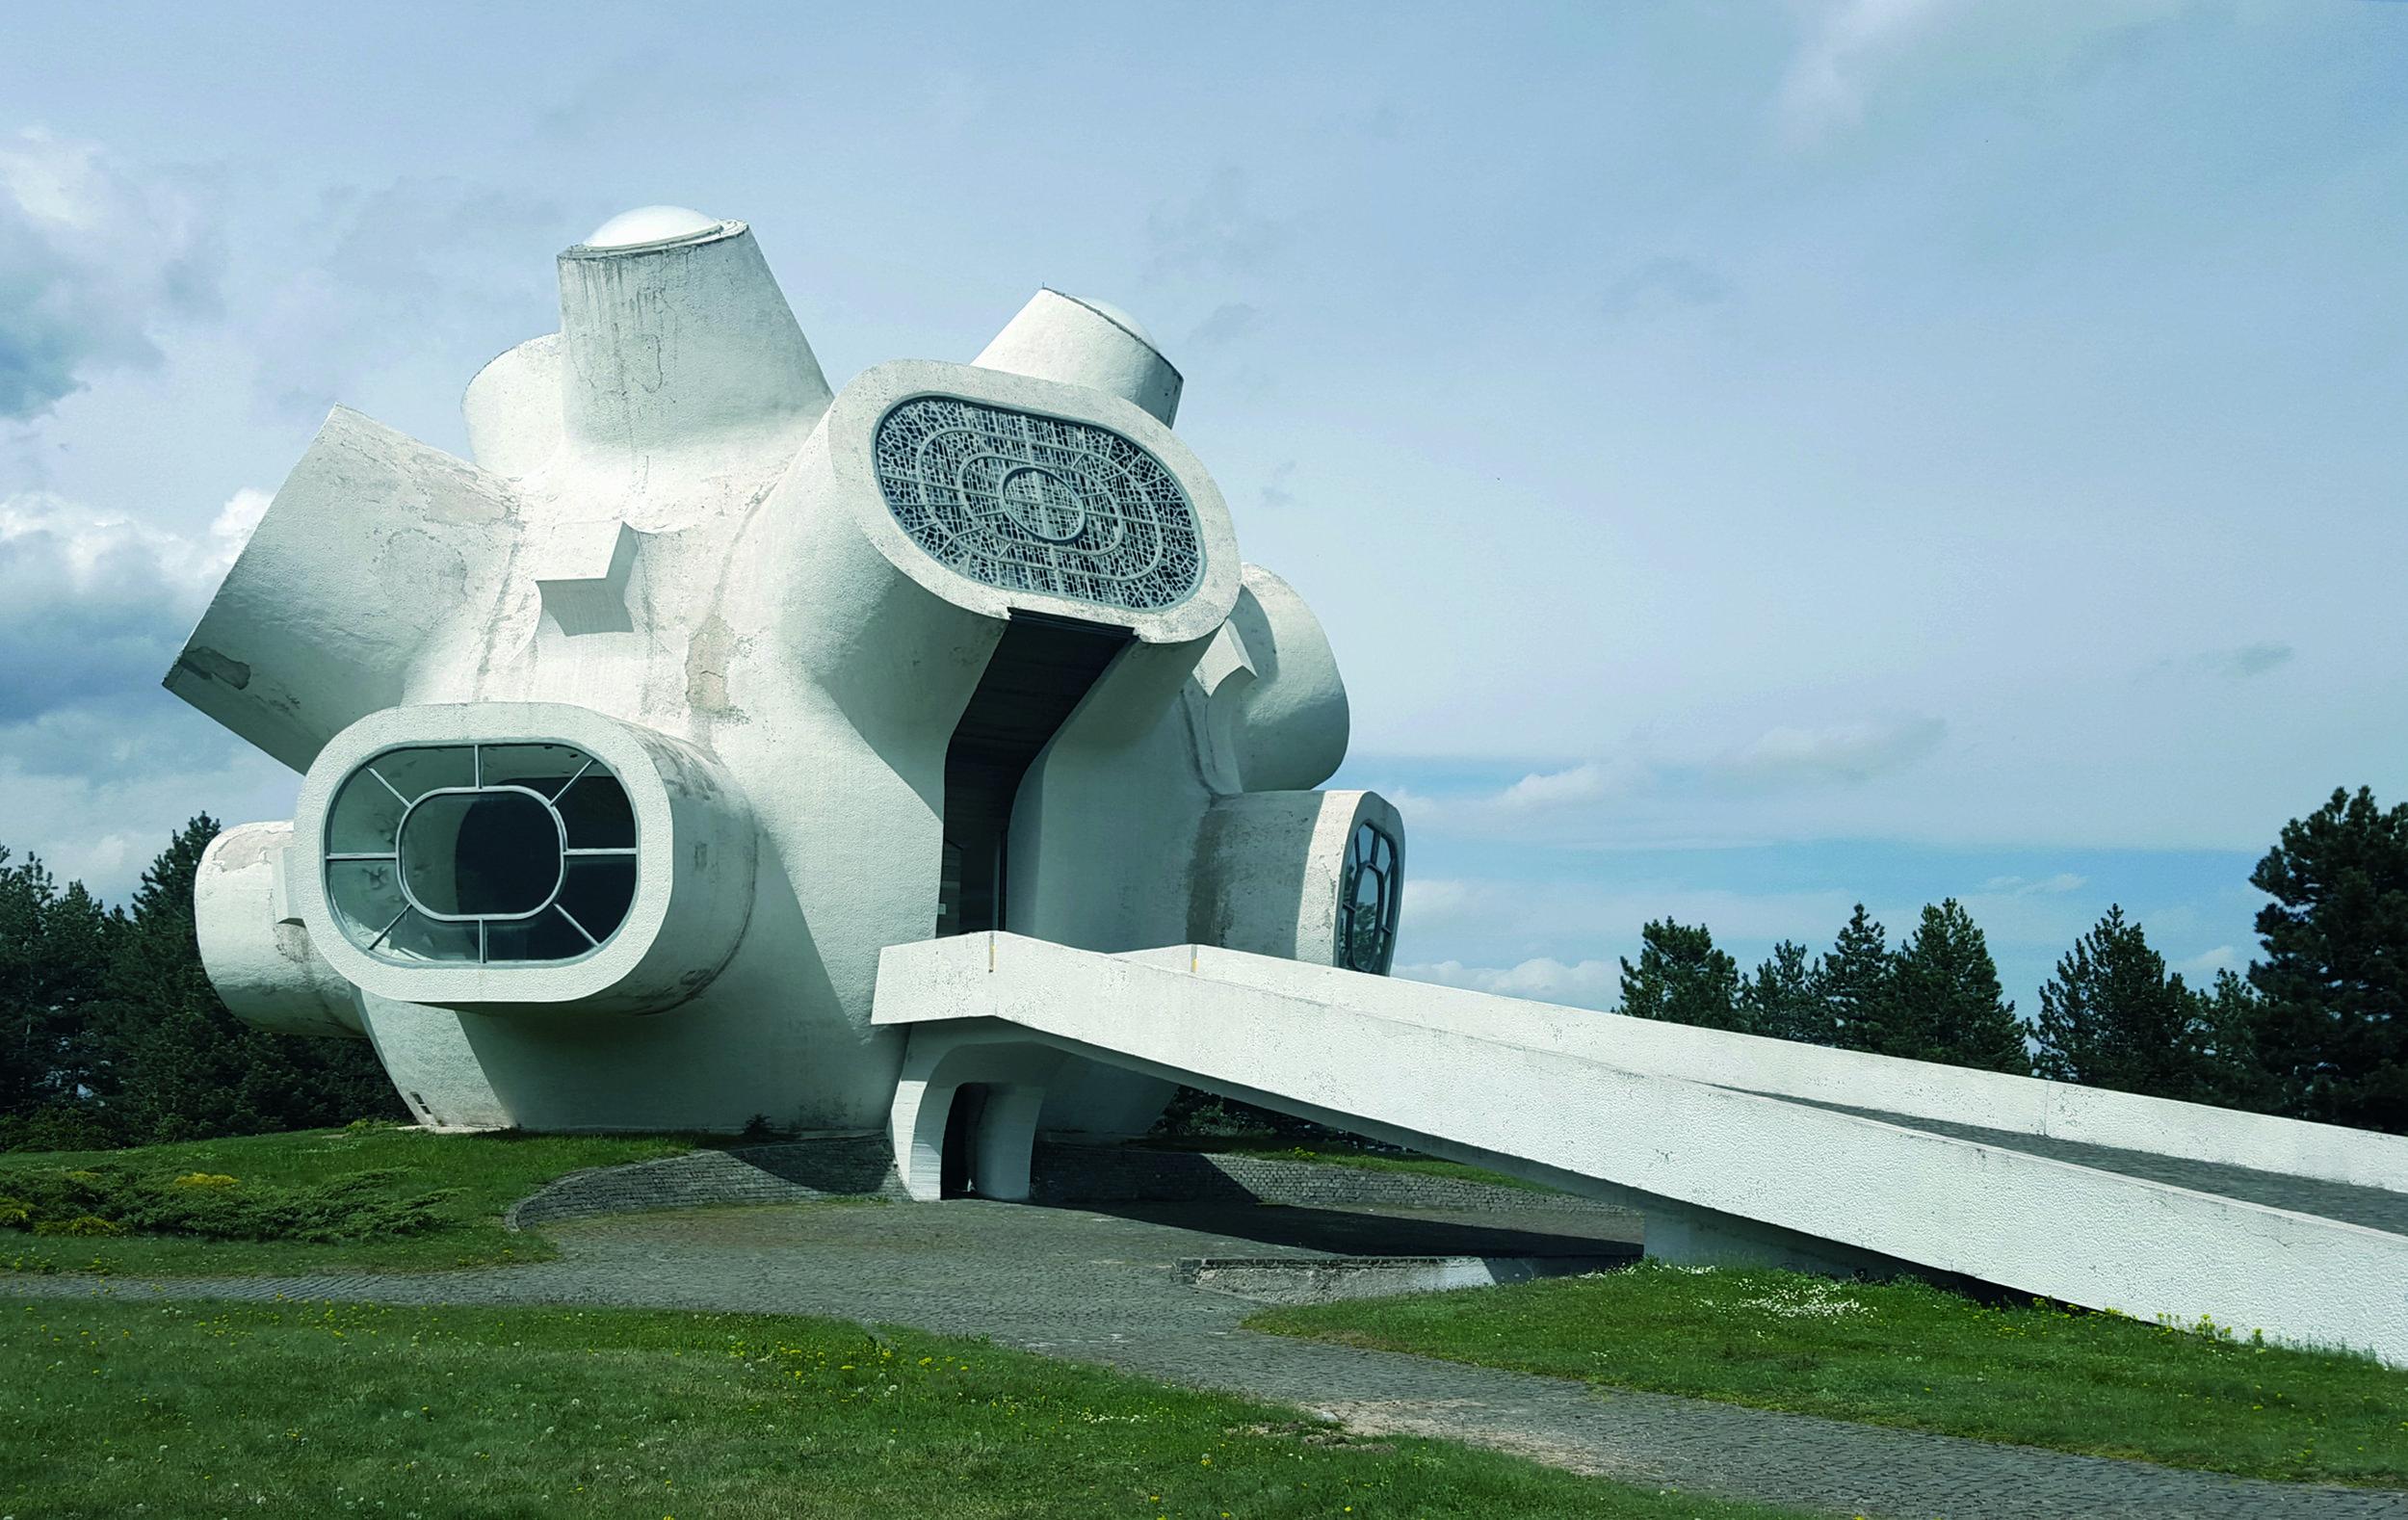 Ilinden Memorial, also known as 'Makedonium', Kruševo, Macedonia. Completed 1974.